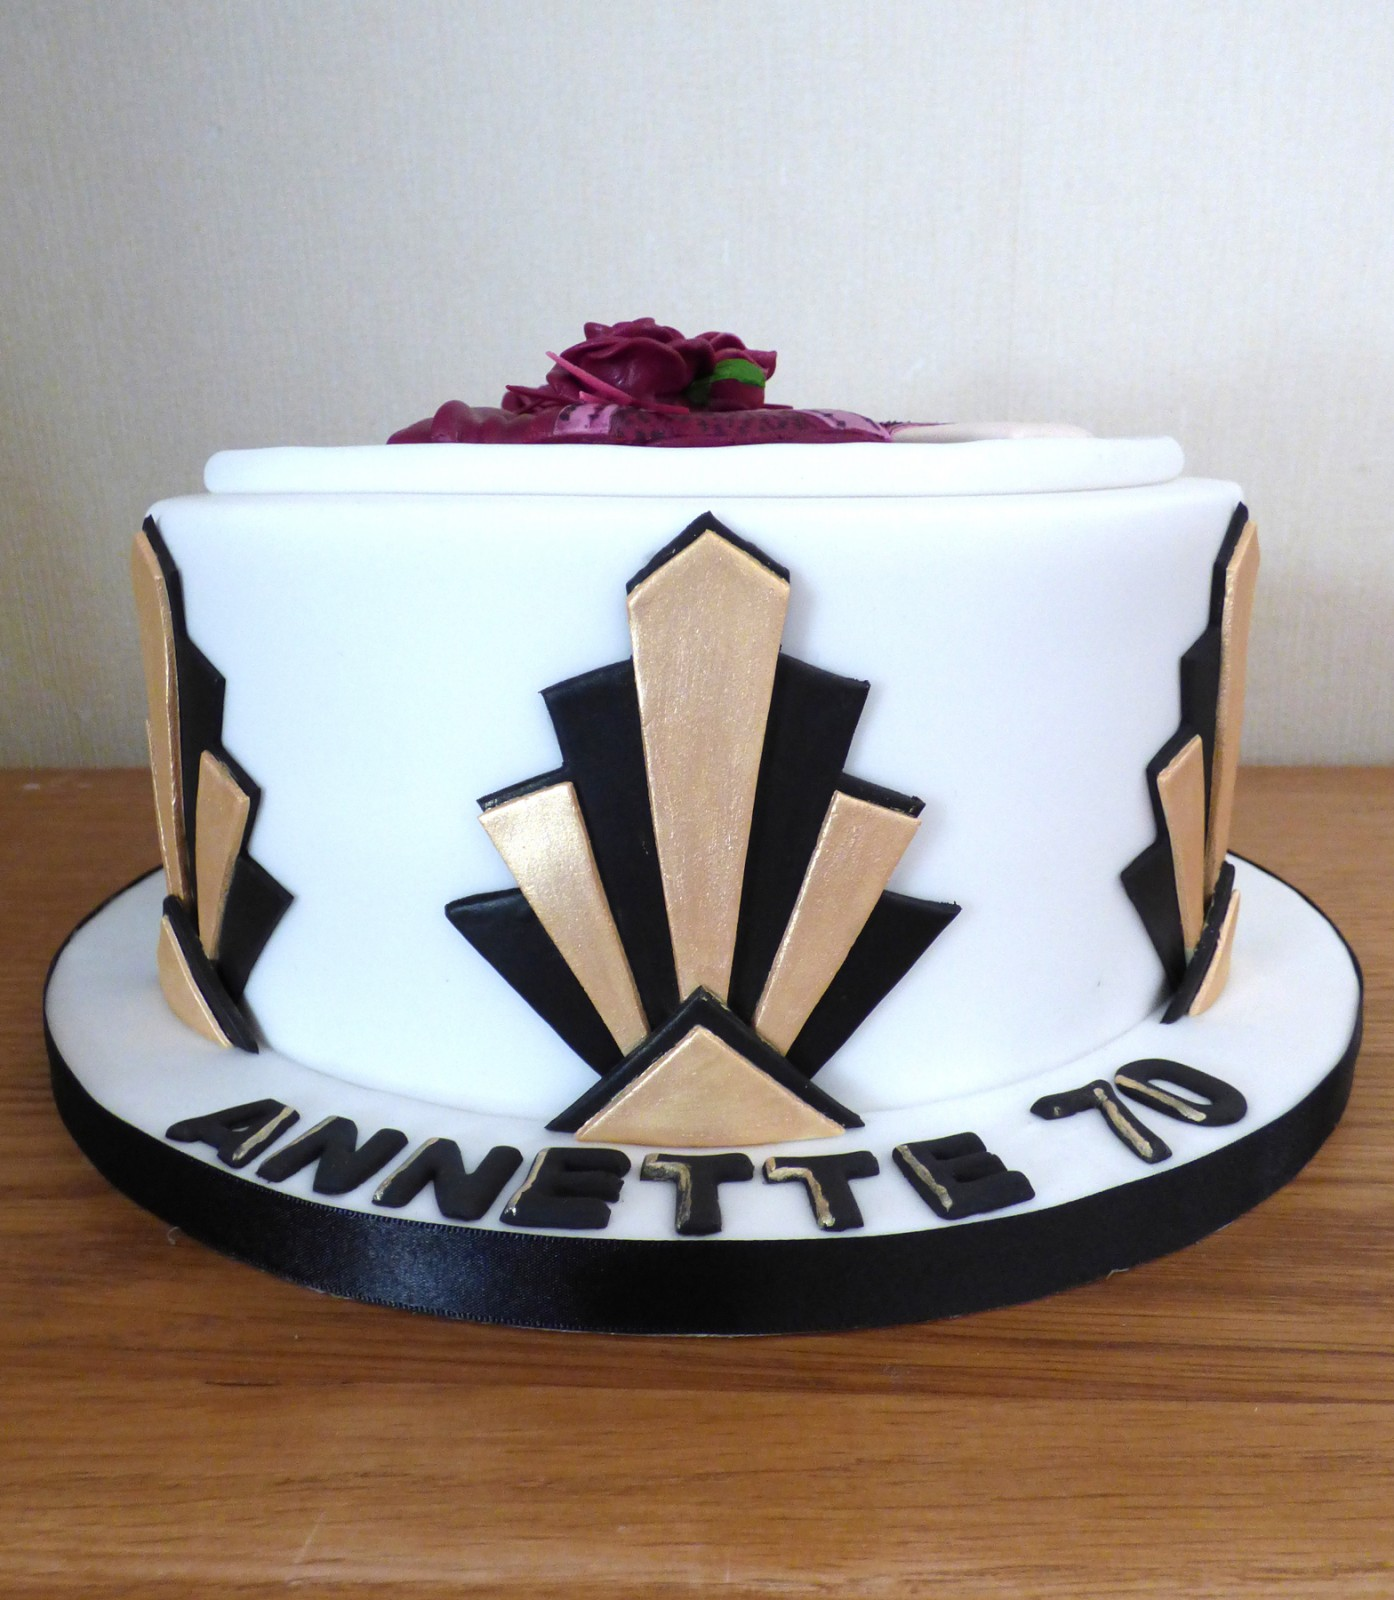 Remarkable Art Deco Lady Birthday Cake Susies Cakes Funny Birthday Cards Online Benoljebrpdamsfinfo